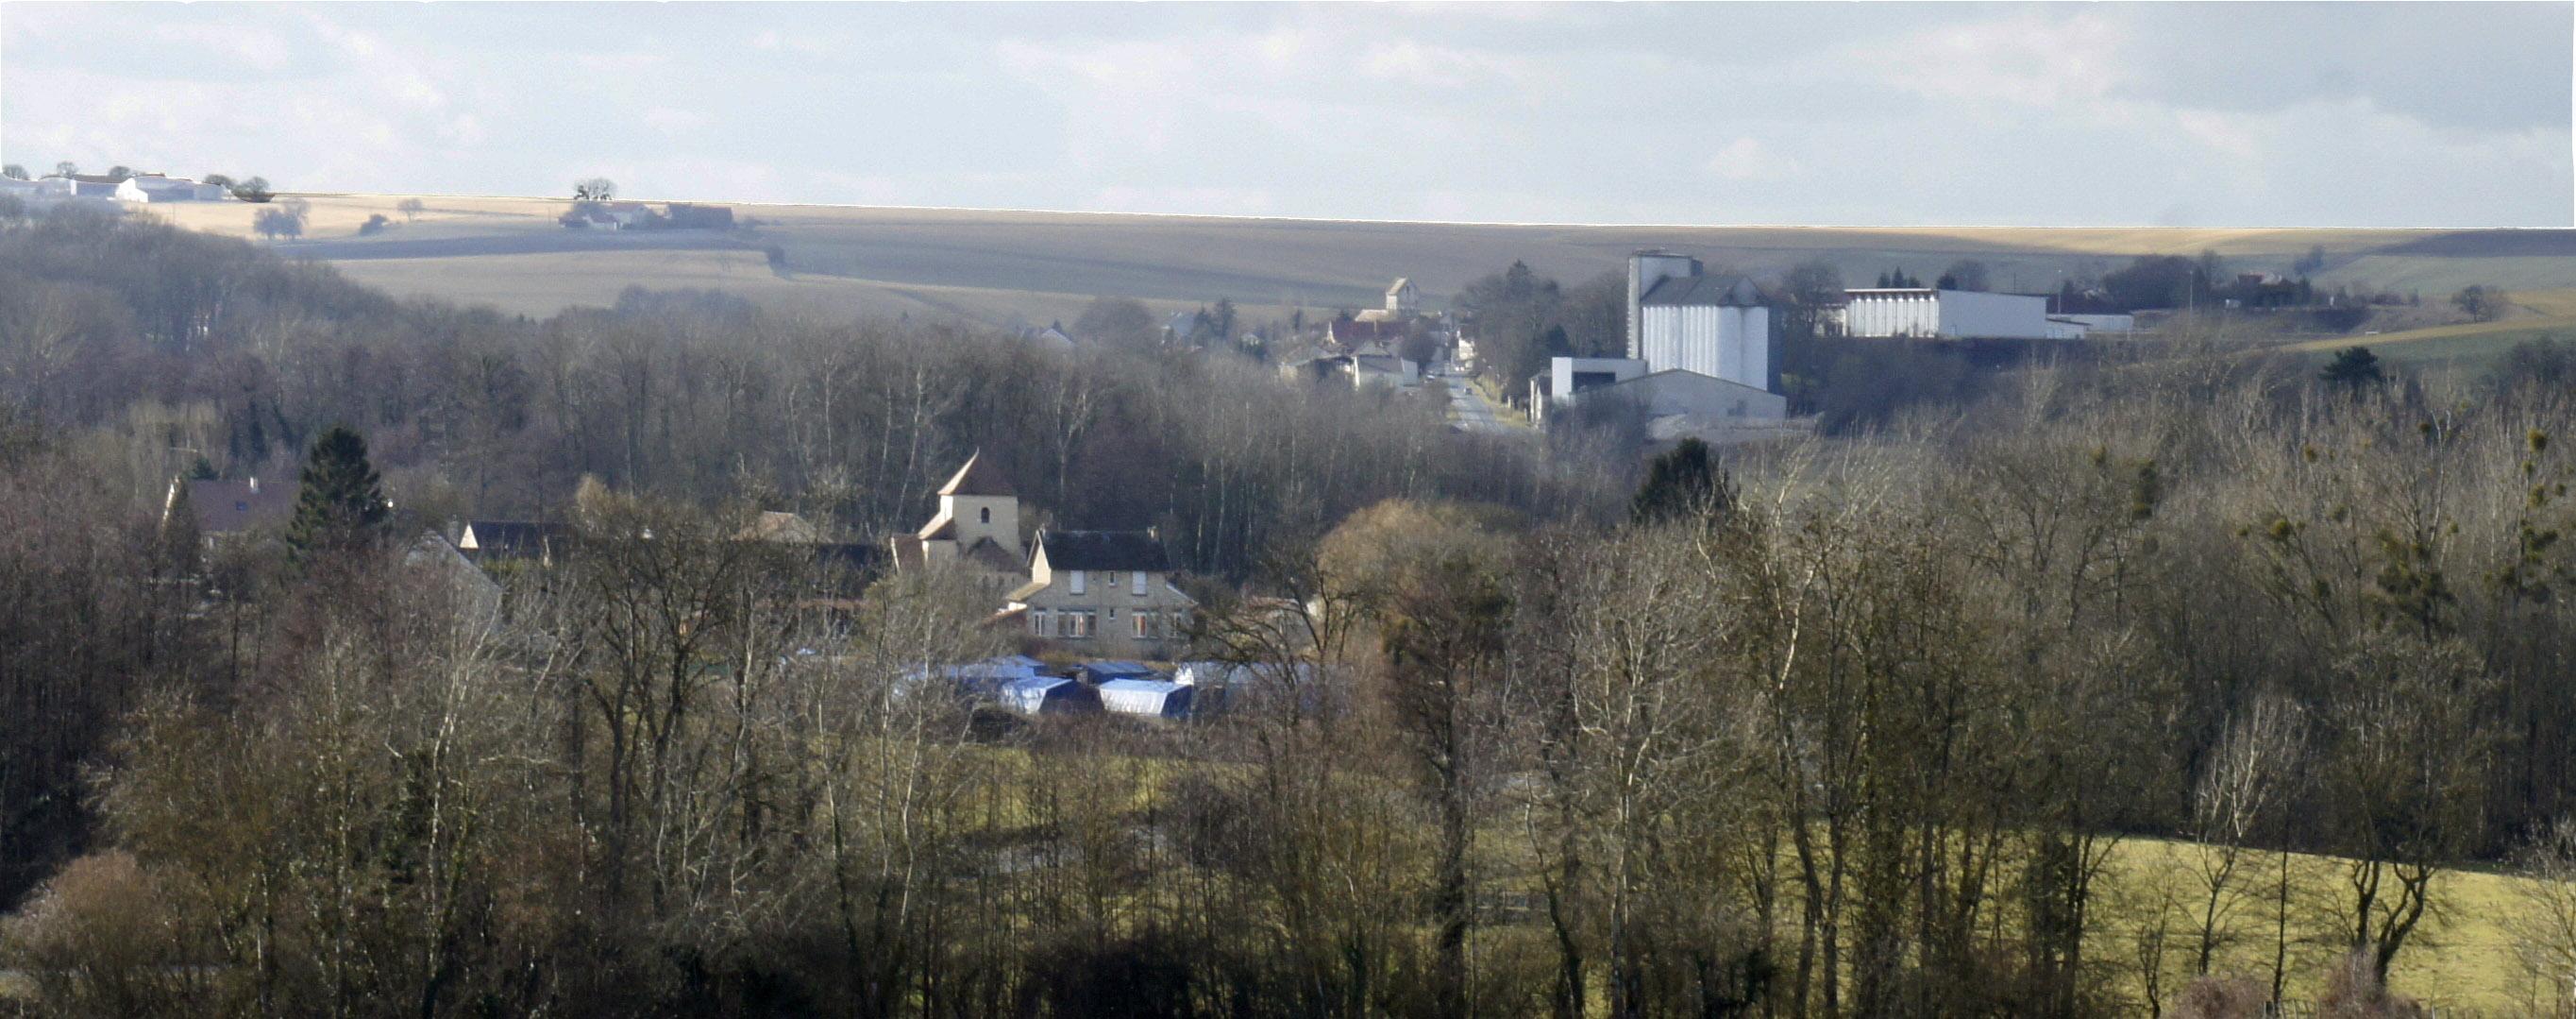 Ville-en-Tardenois